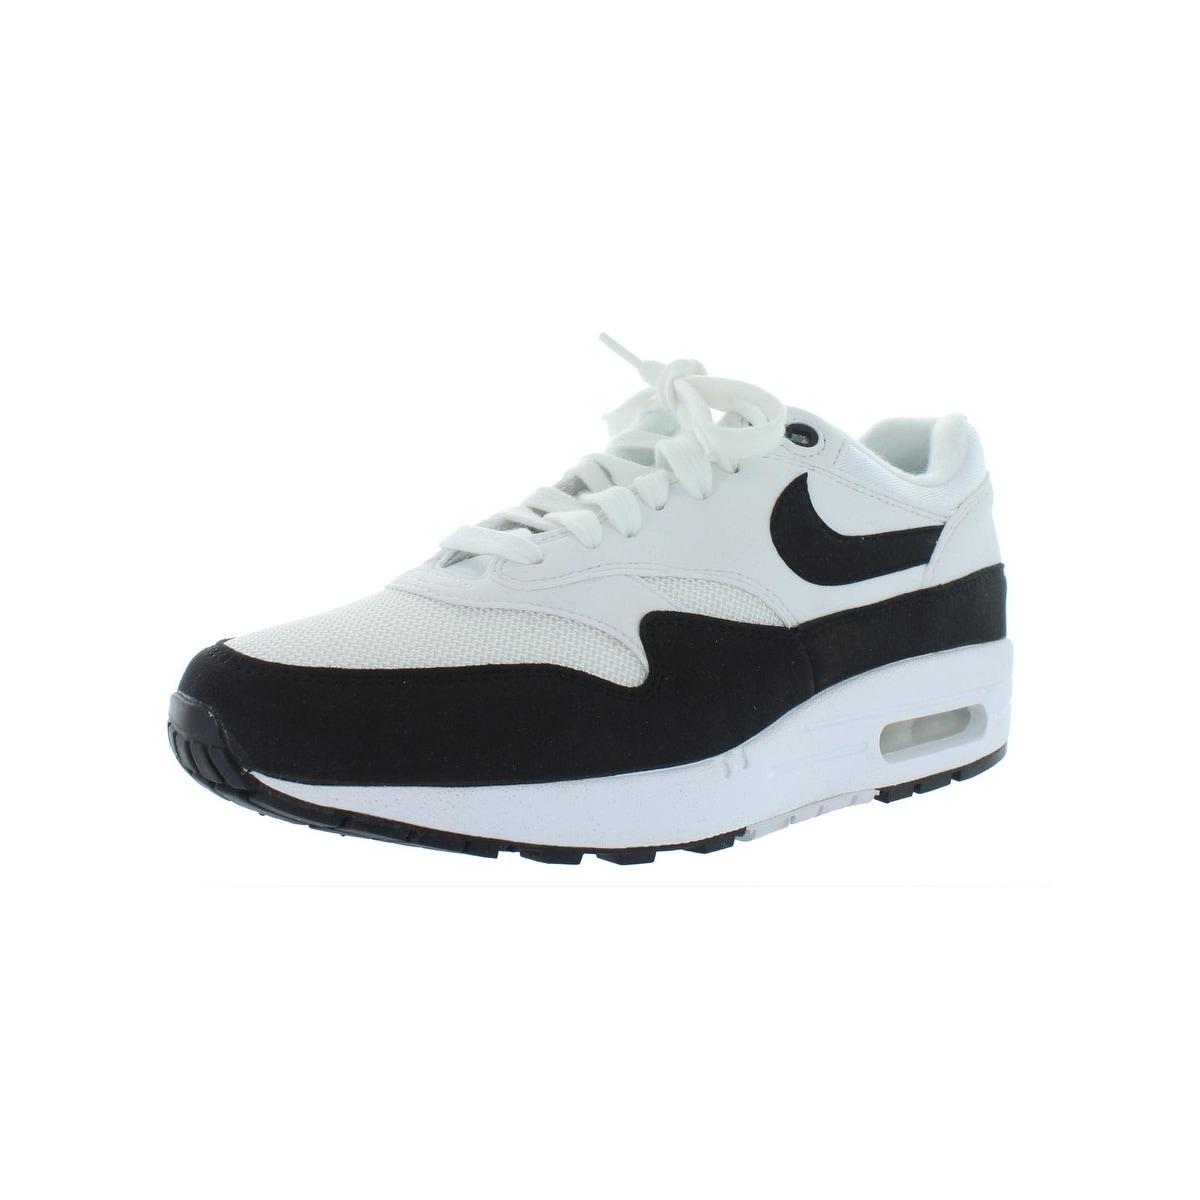 Nike Womens Air Max 1 Premium SC Suede Athletic Shoes Gray 8.5 Medium (B,M)